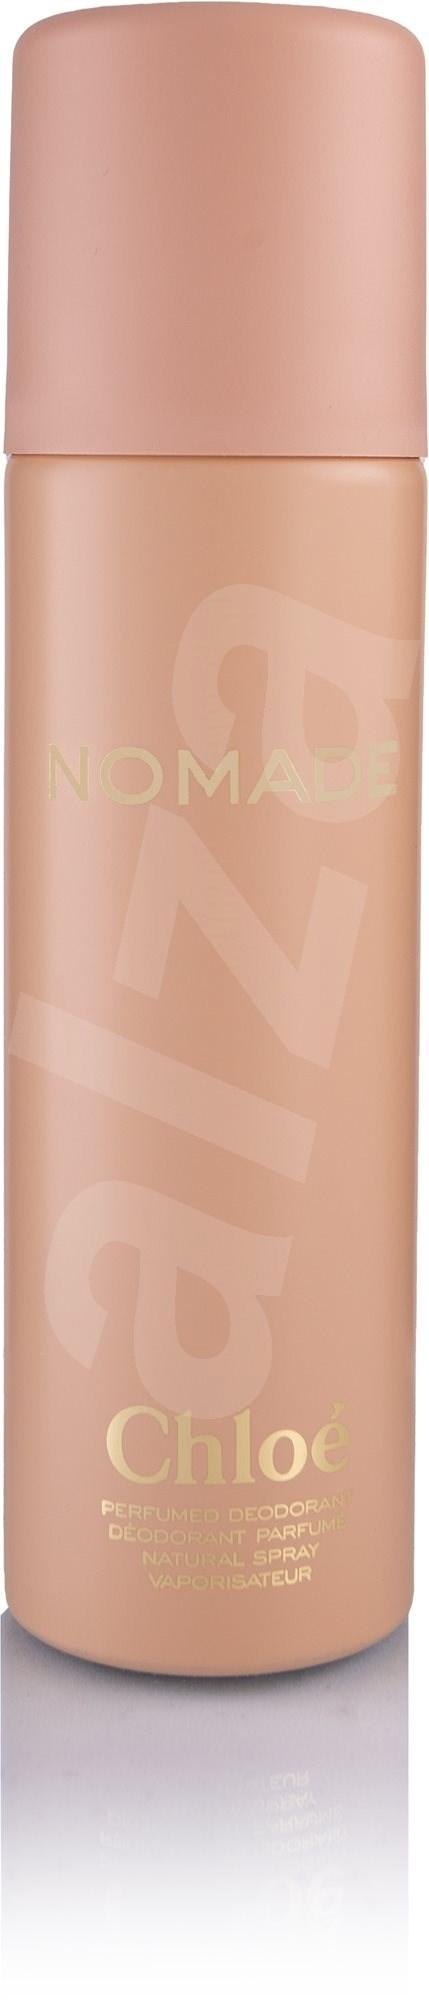 CHLOÉ Nomade 100 ml - Női dezodor